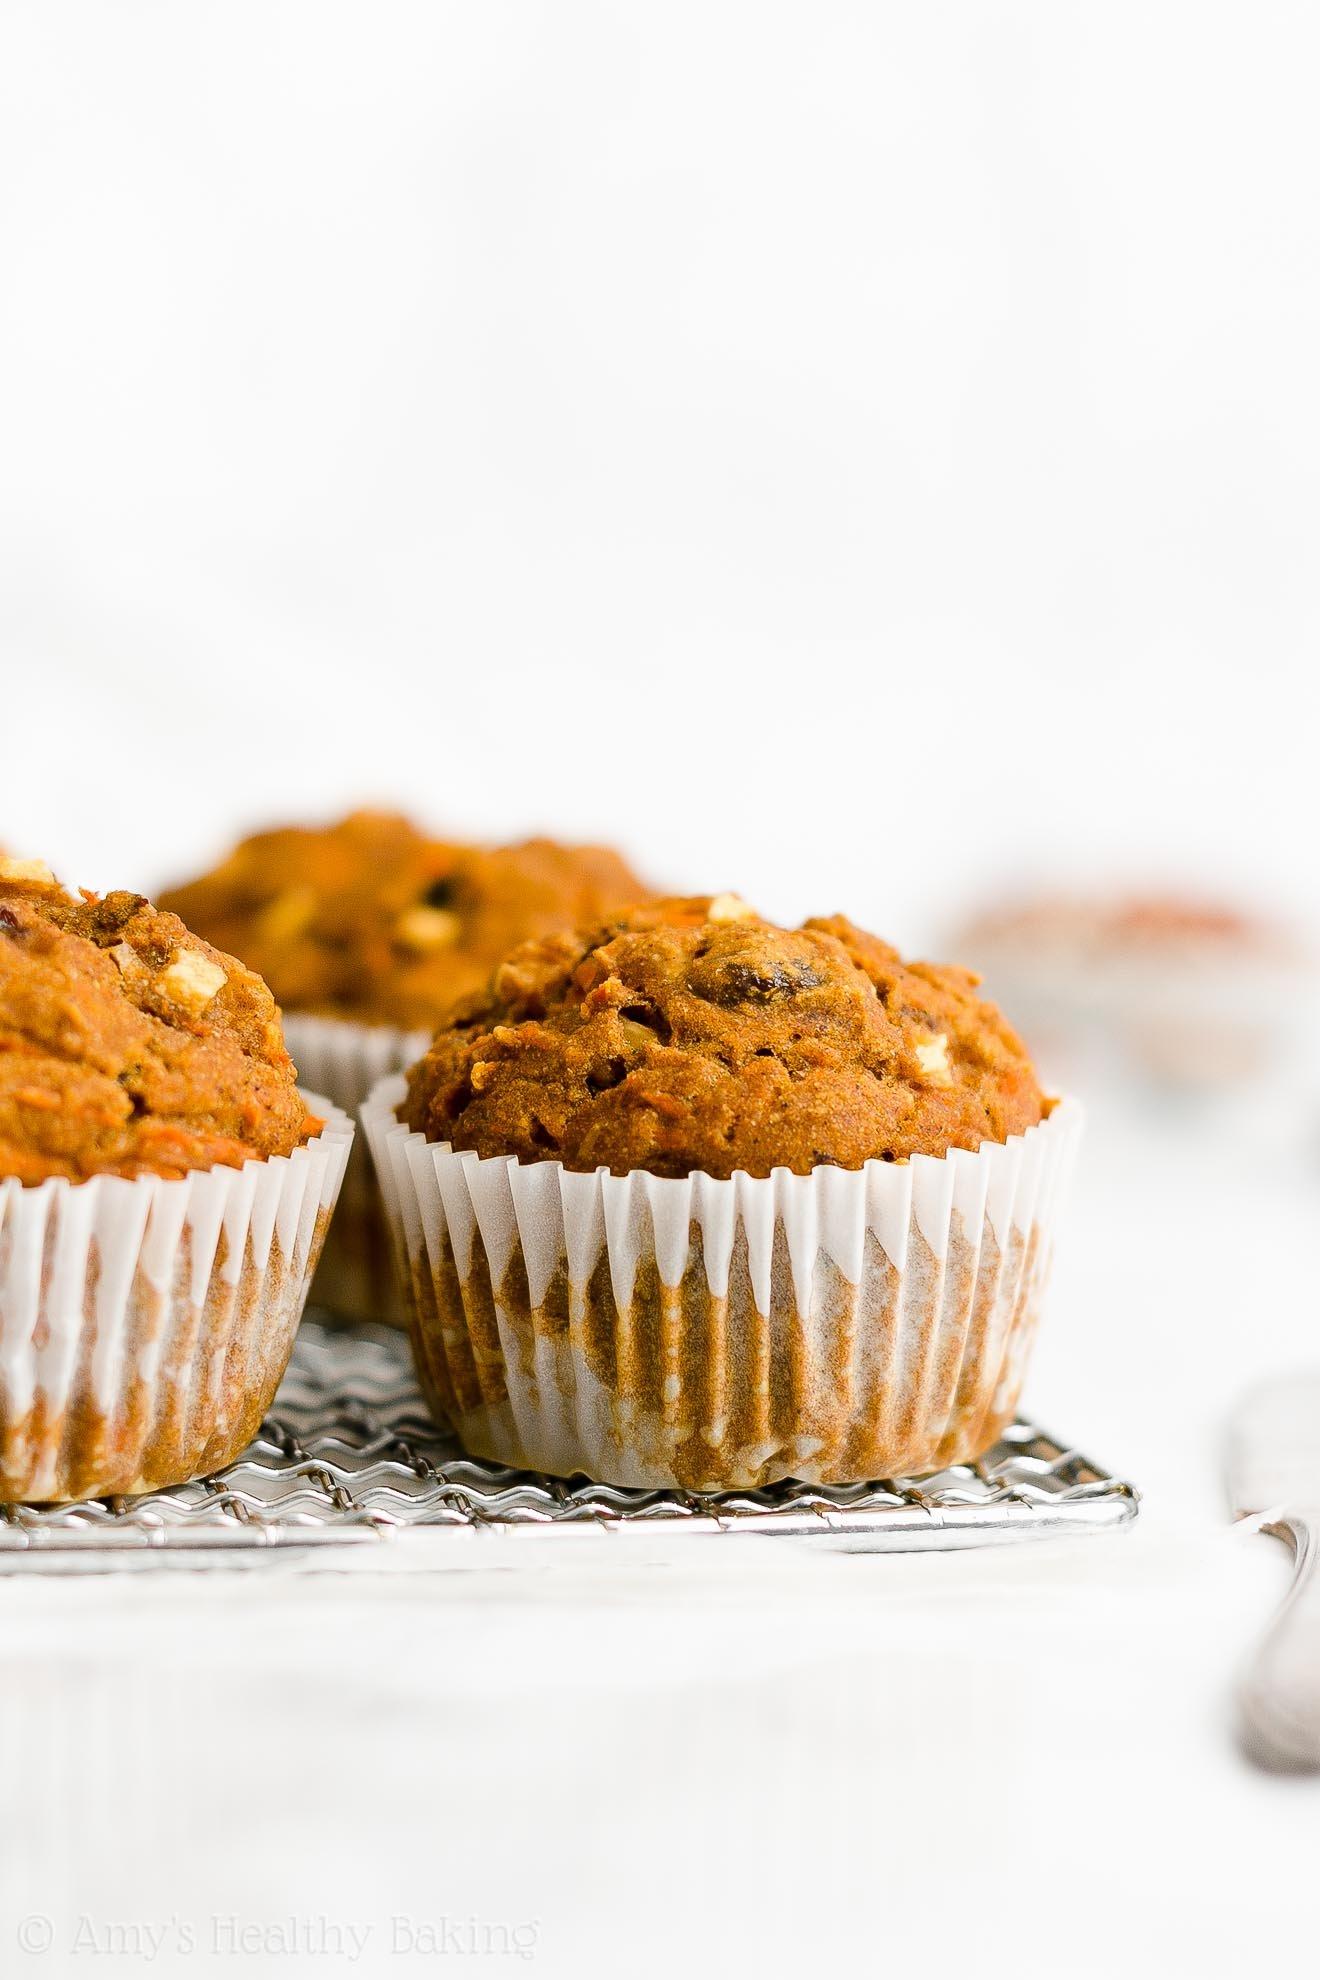 Best Easy Healthy Gluten Free Sugar Free Moist Pumpkin Morning Glory Muffins